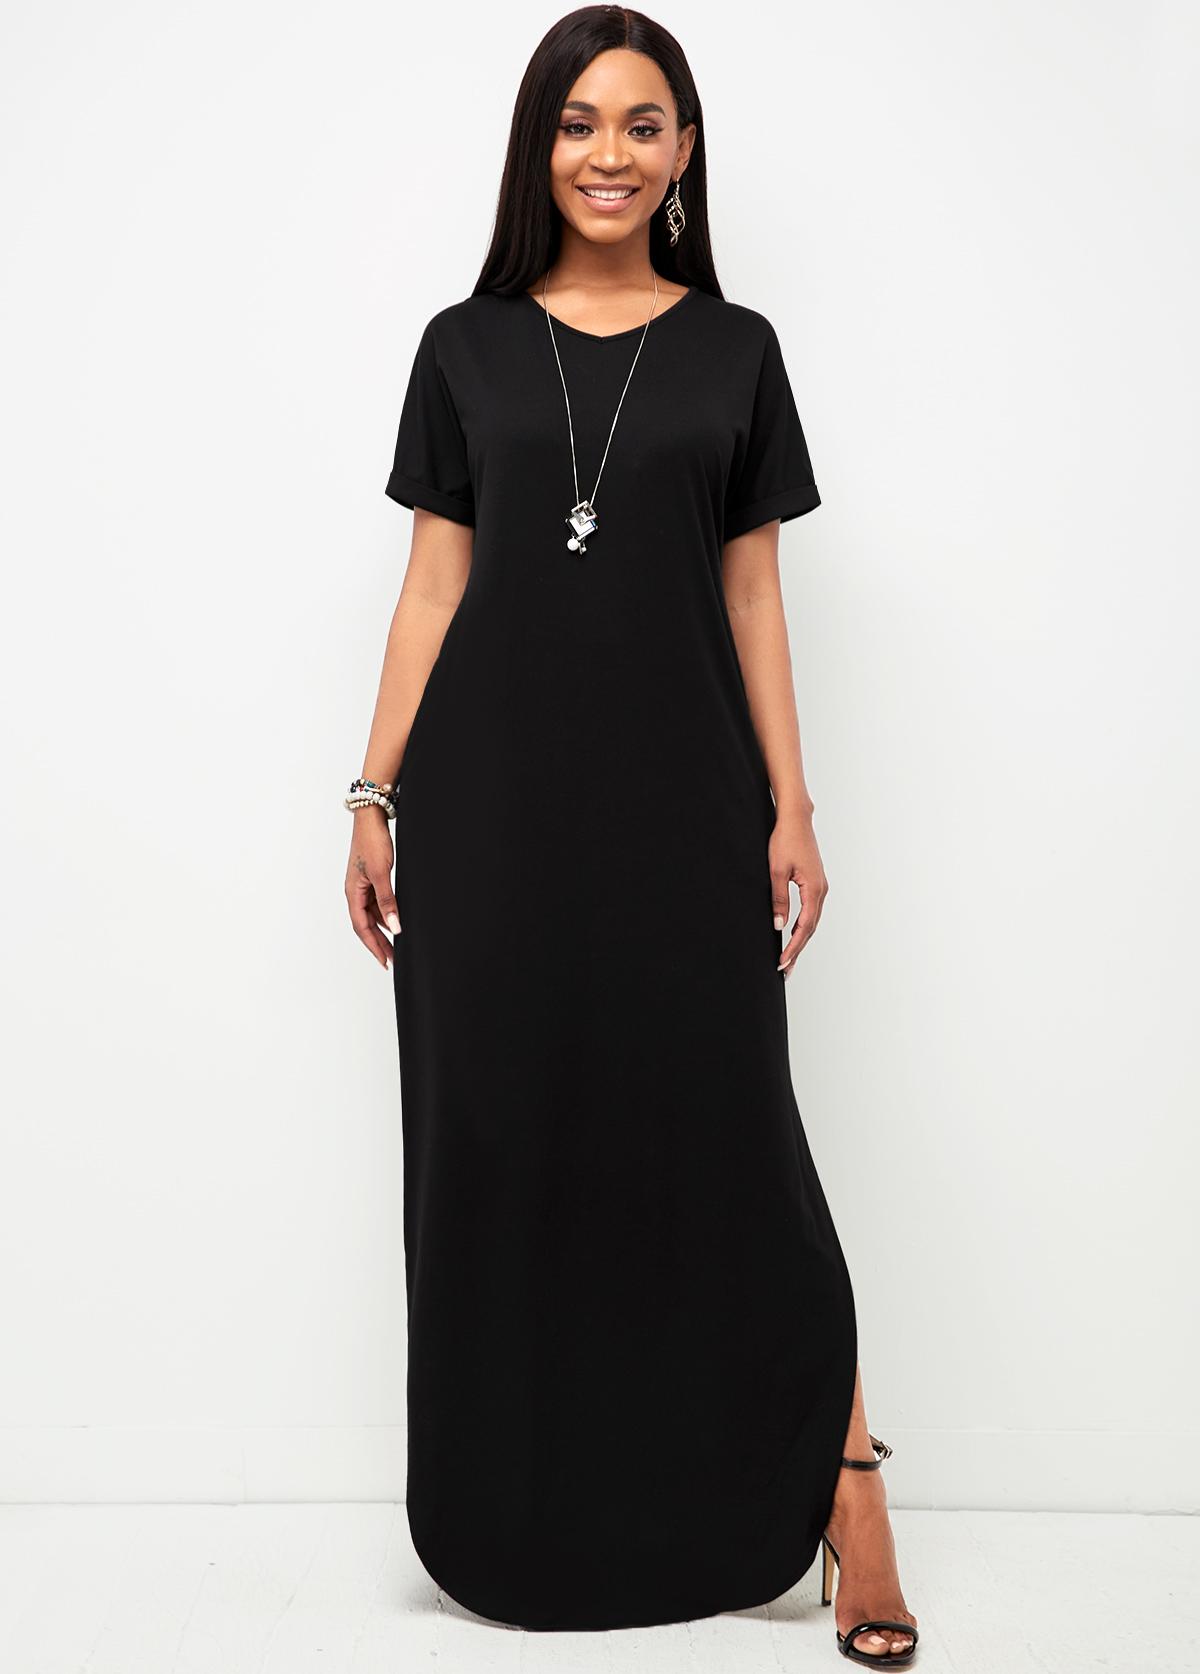 Pocket V Neck Black Casual Dress